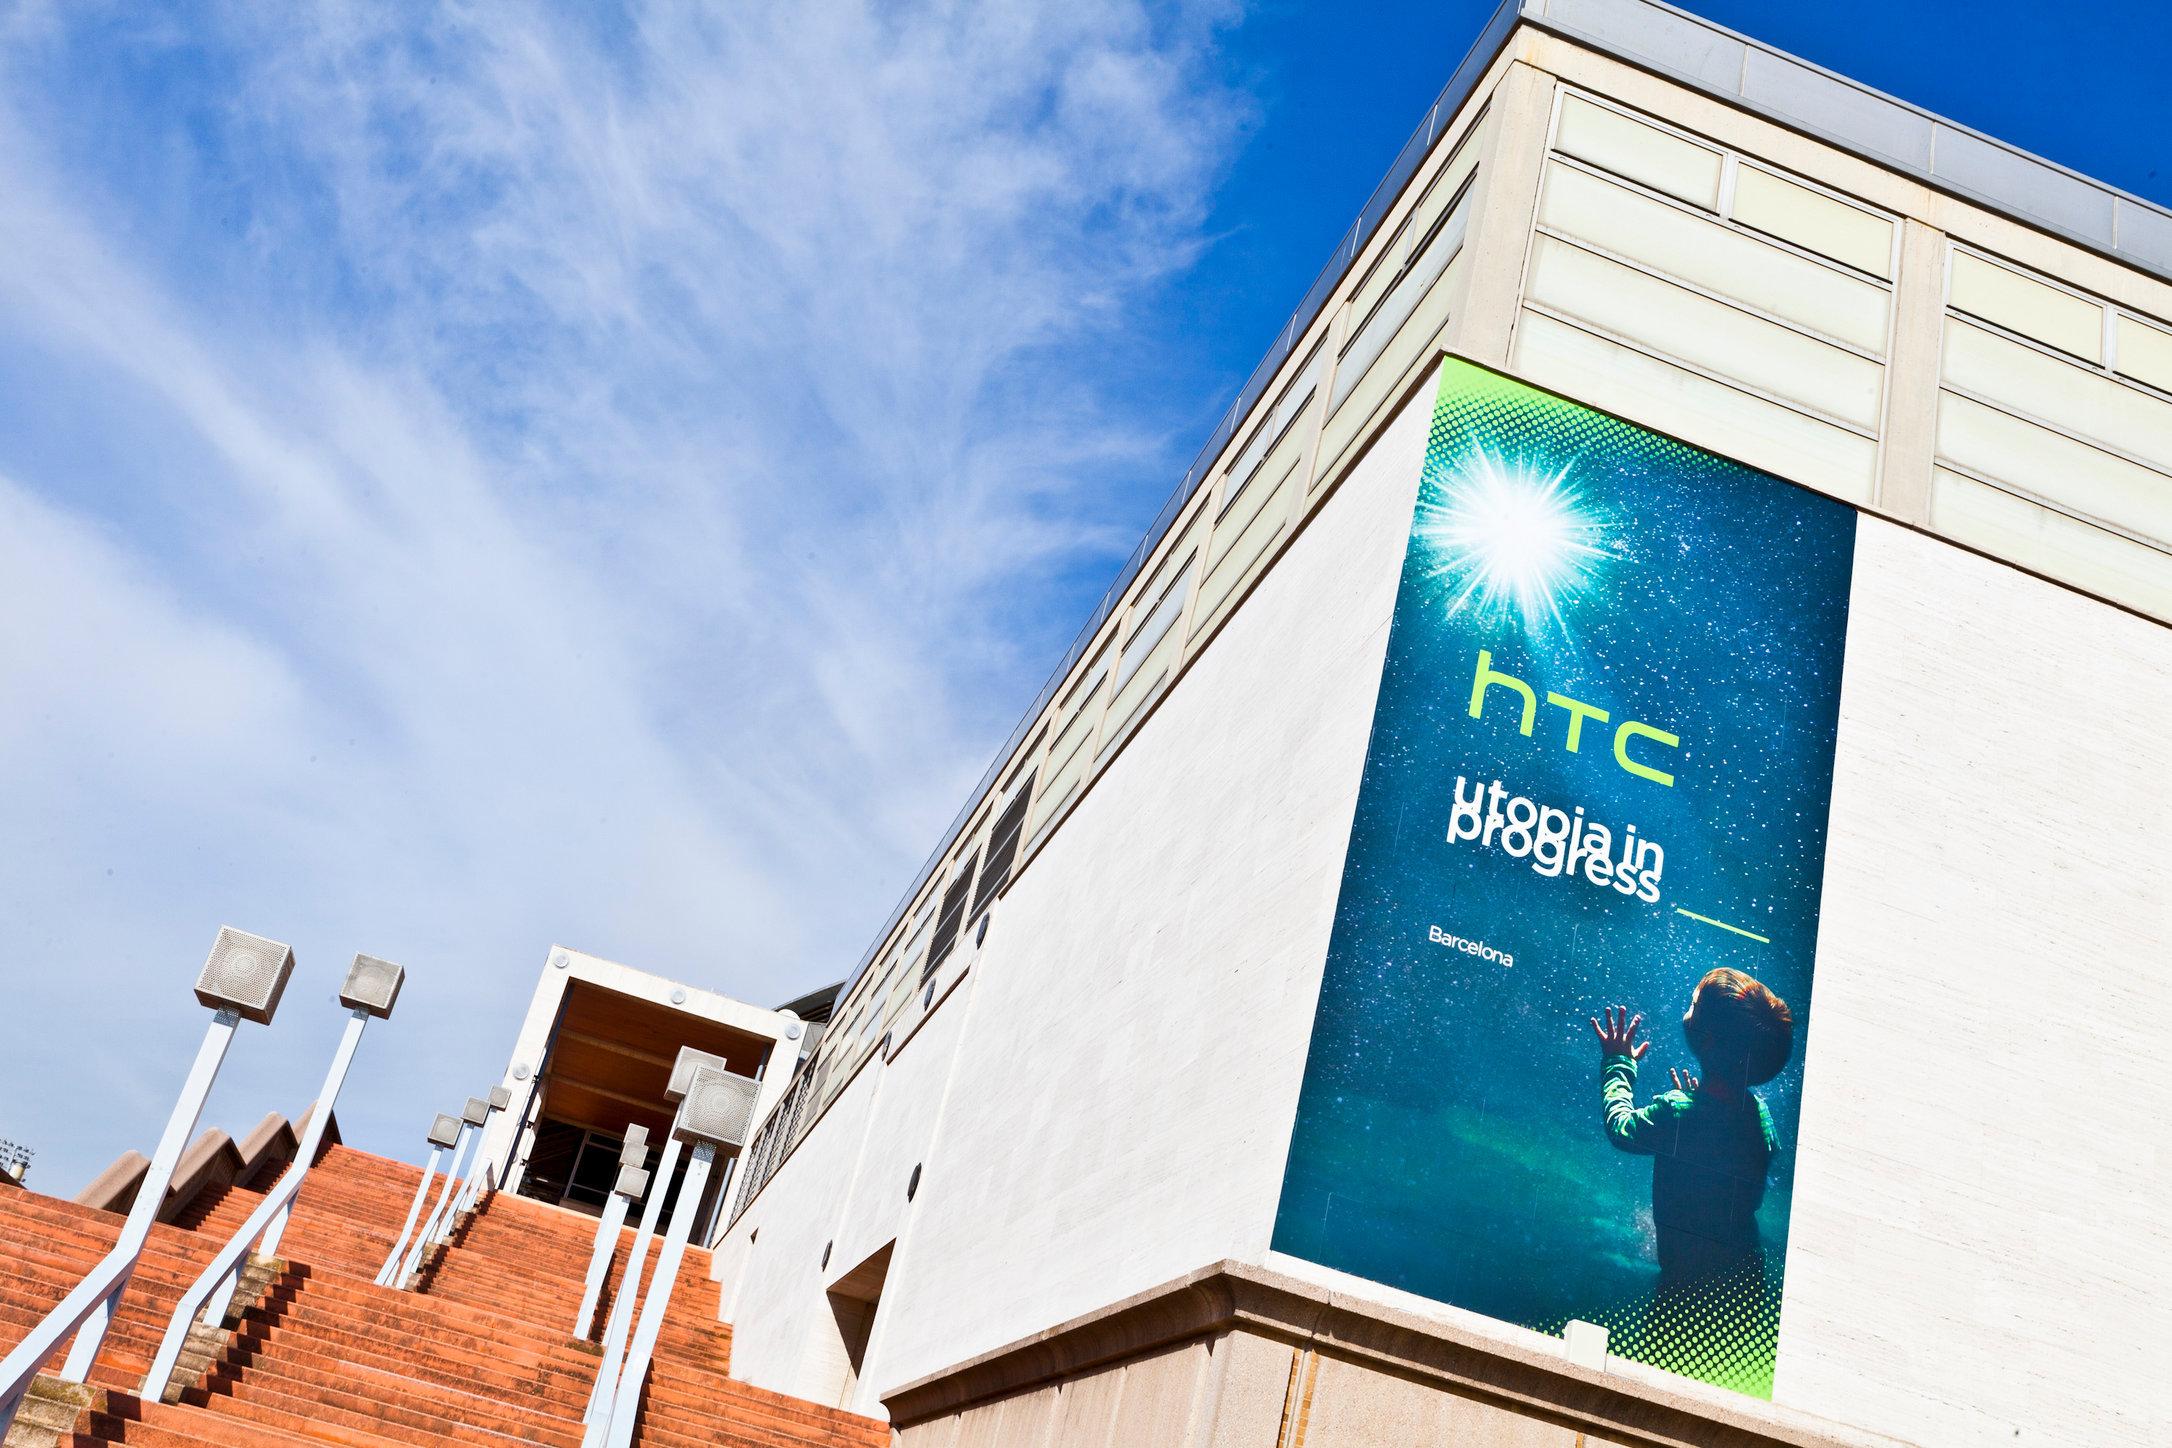 0001_HTC-Barcelona2015-2113-HighRes.jpg